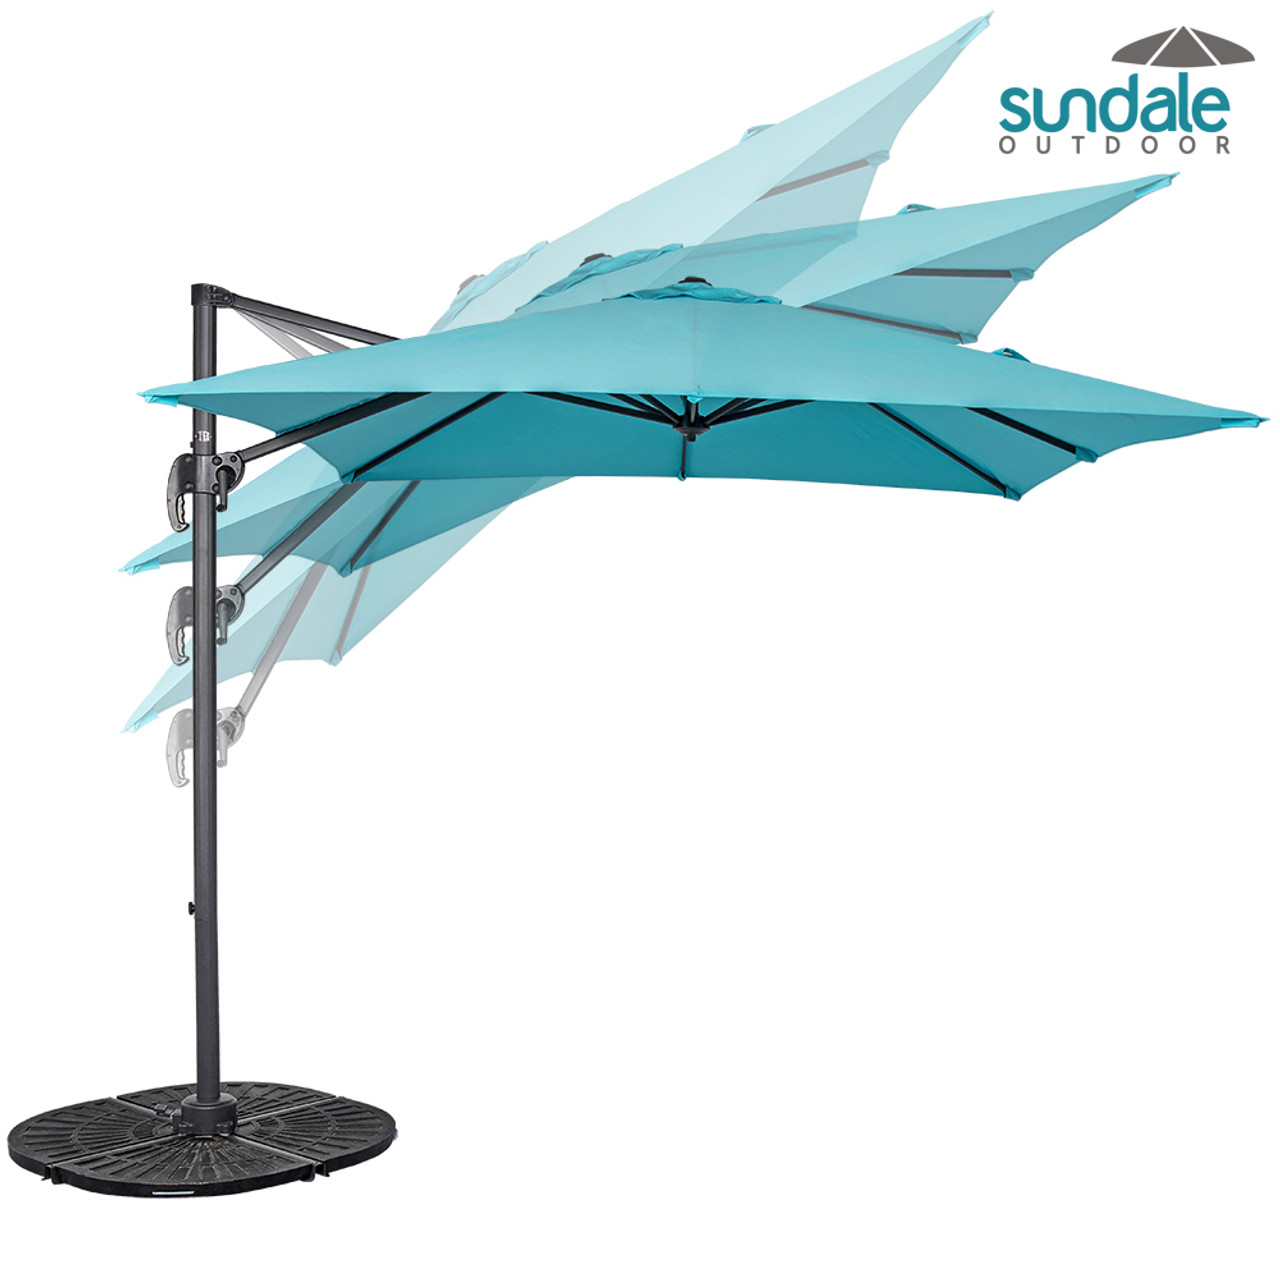 8.2ft Square Hanging Roma Offset Umbrella Outdoor Patio Sun Shade  Cantilever Crank Canopy (Light Blue)